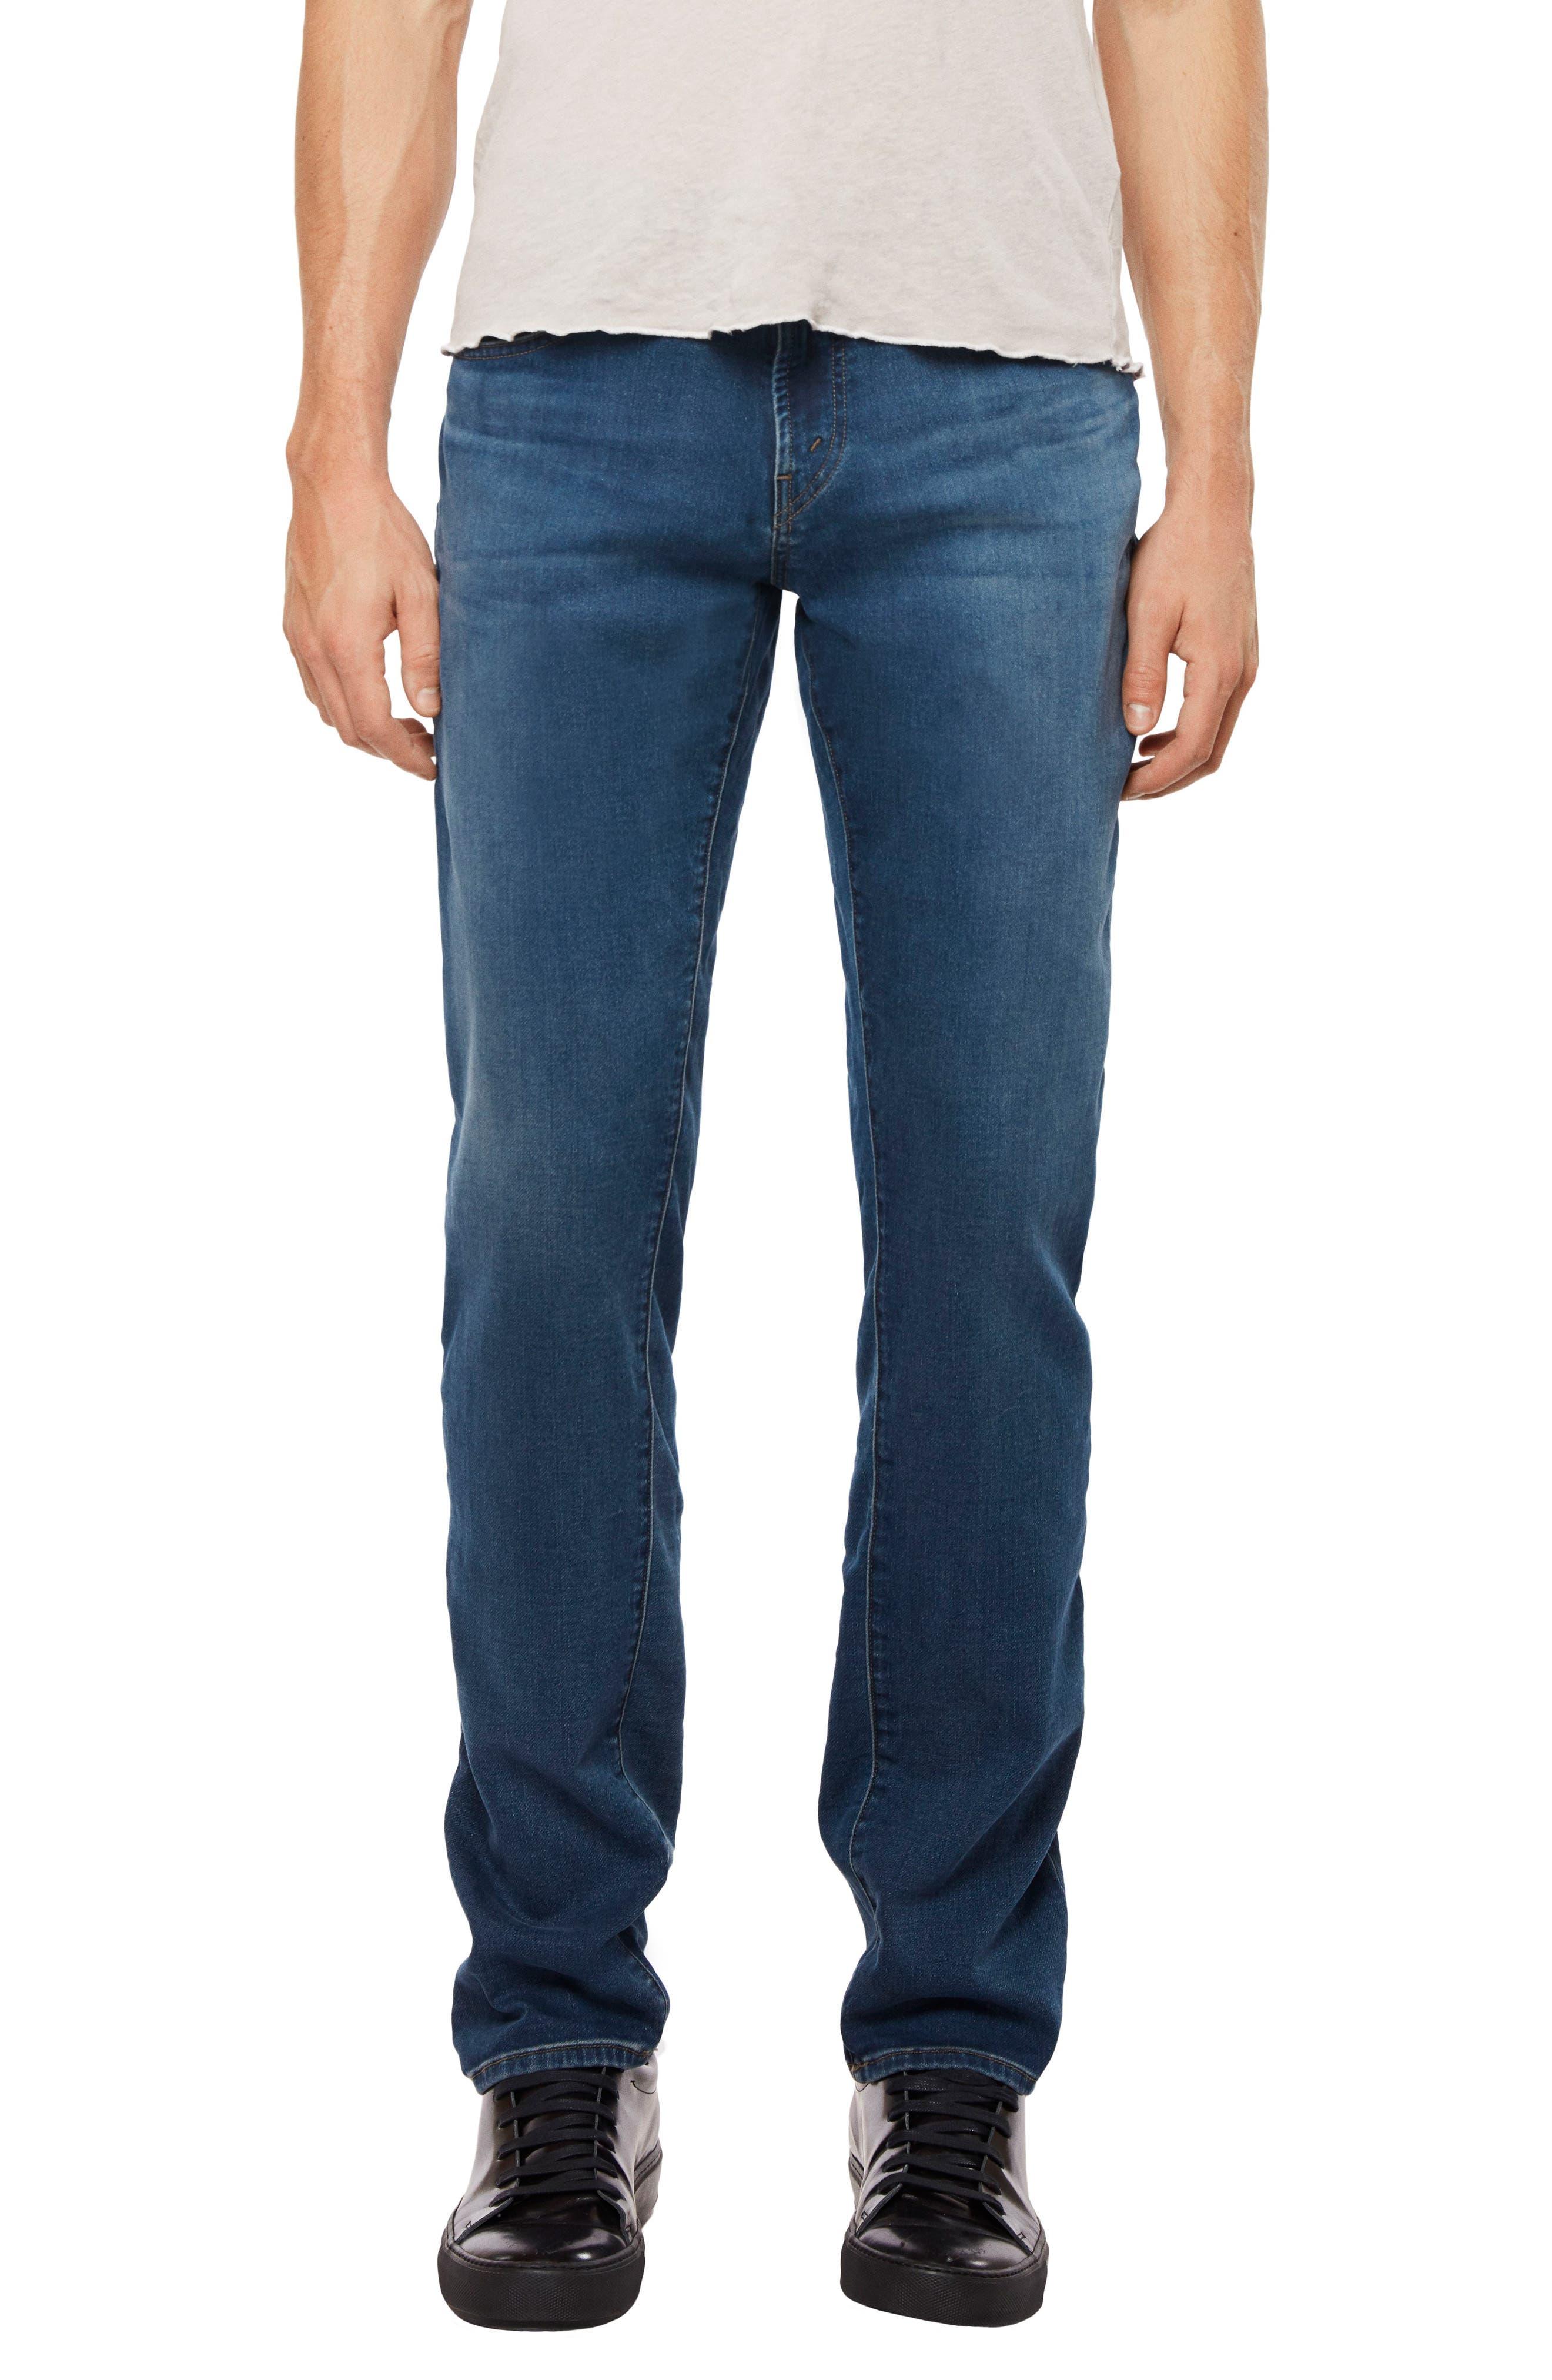 Kane Slim Straight Leg Jeans,                             Main thumbnail 1, color,                             454